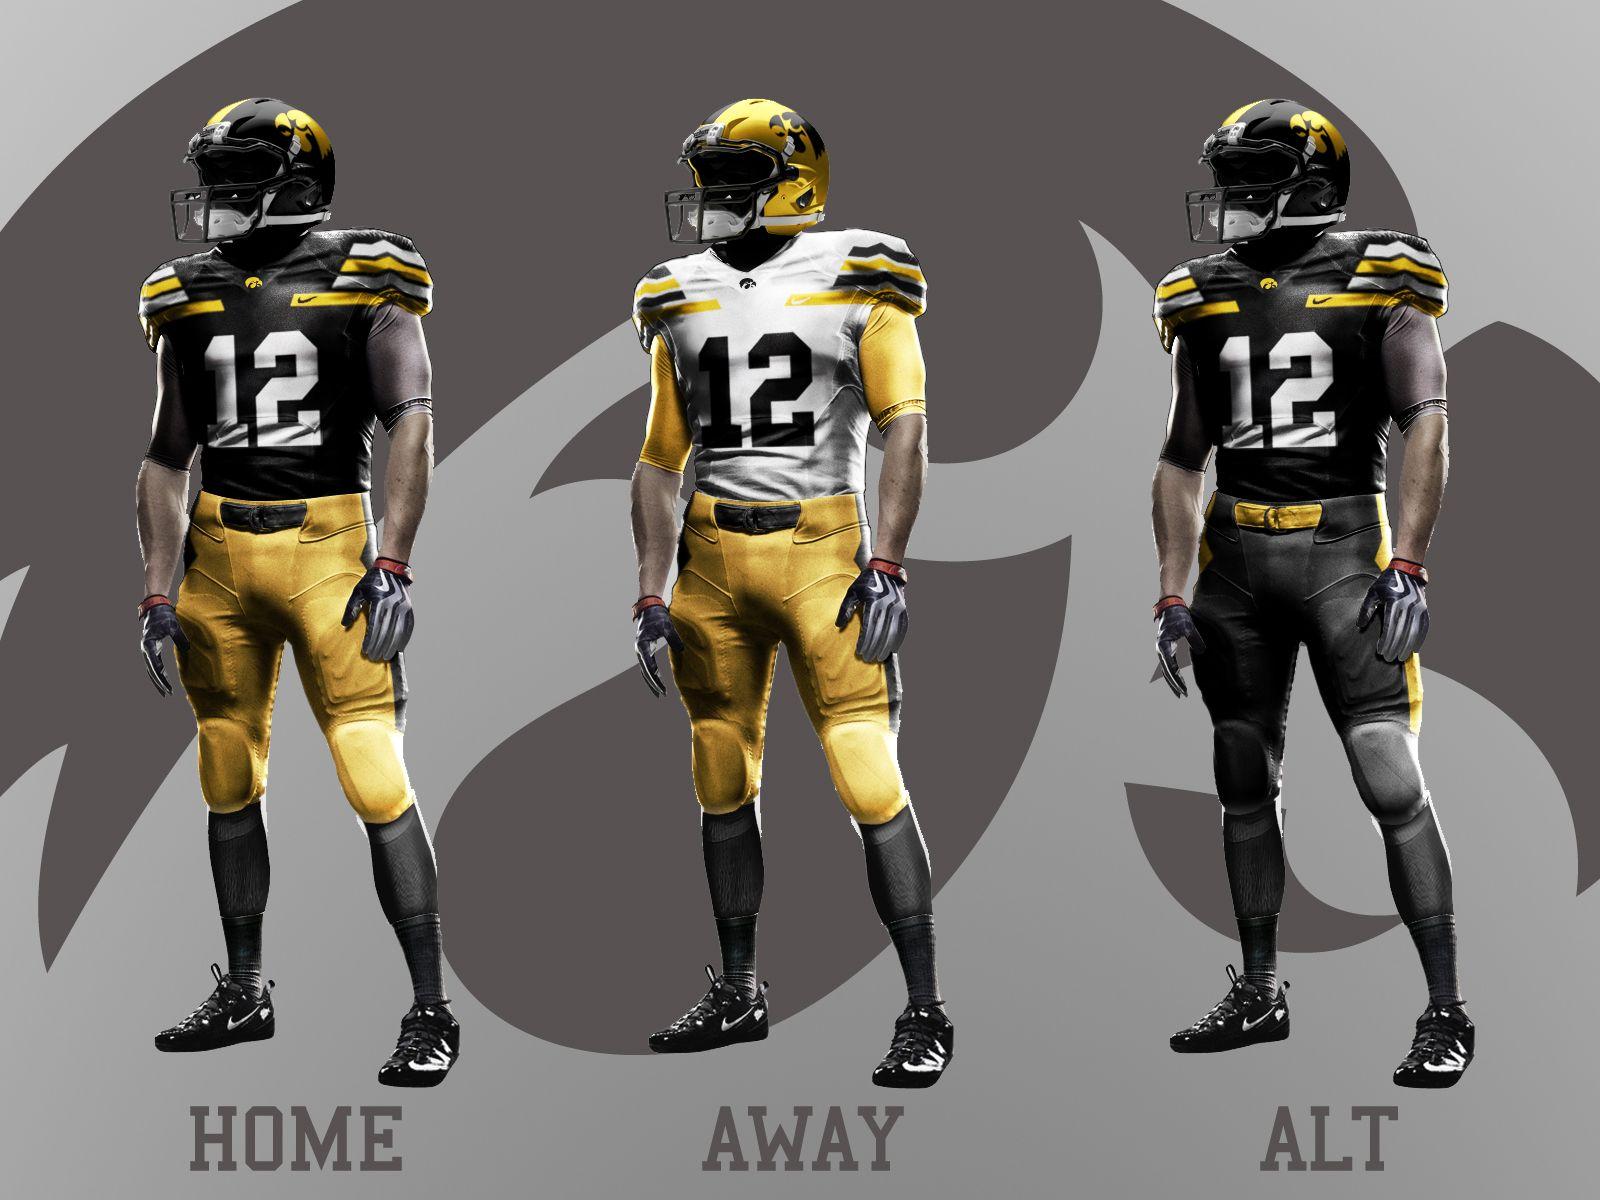 Iowa Hawkeyes Football Nike Pro Combat Jersey Mockups.  www.GriffinVanDyke.com d2235795e